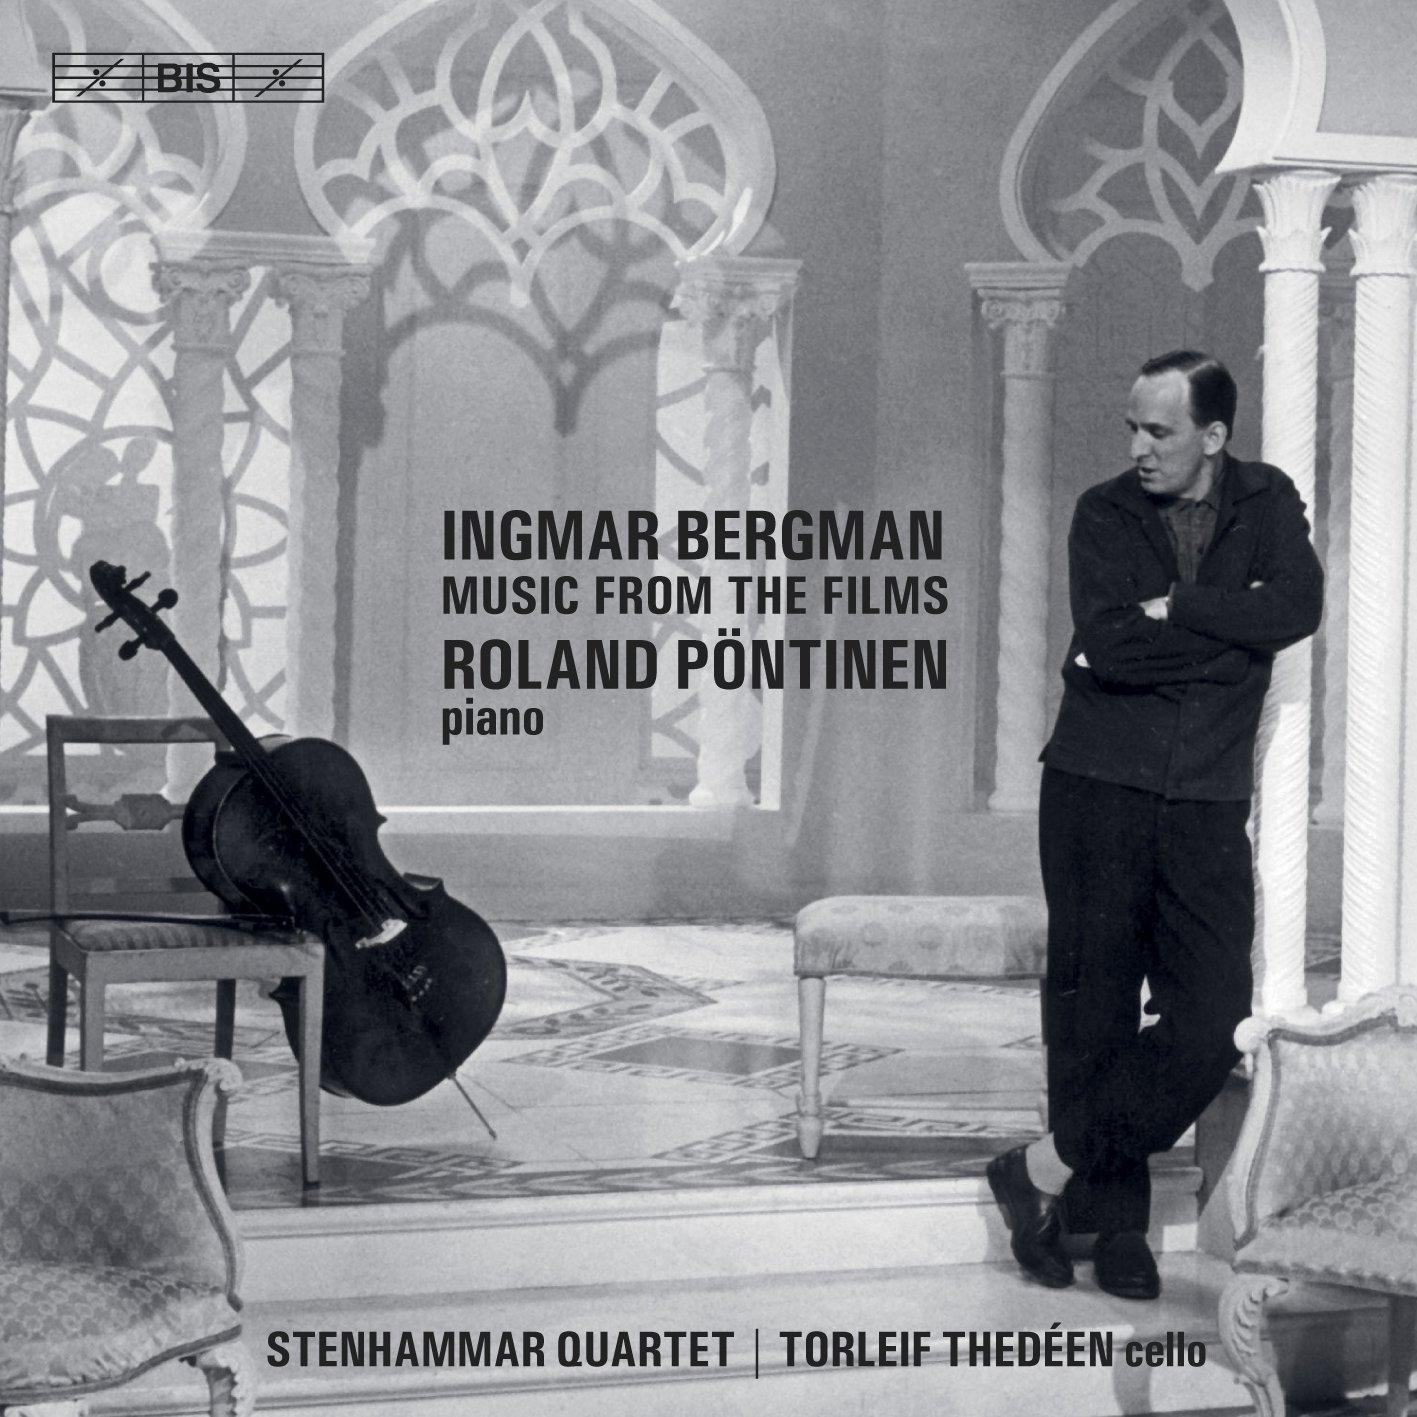 SACD : ROLAND PONTINEN - Music From The Films (Hybrid SACD)